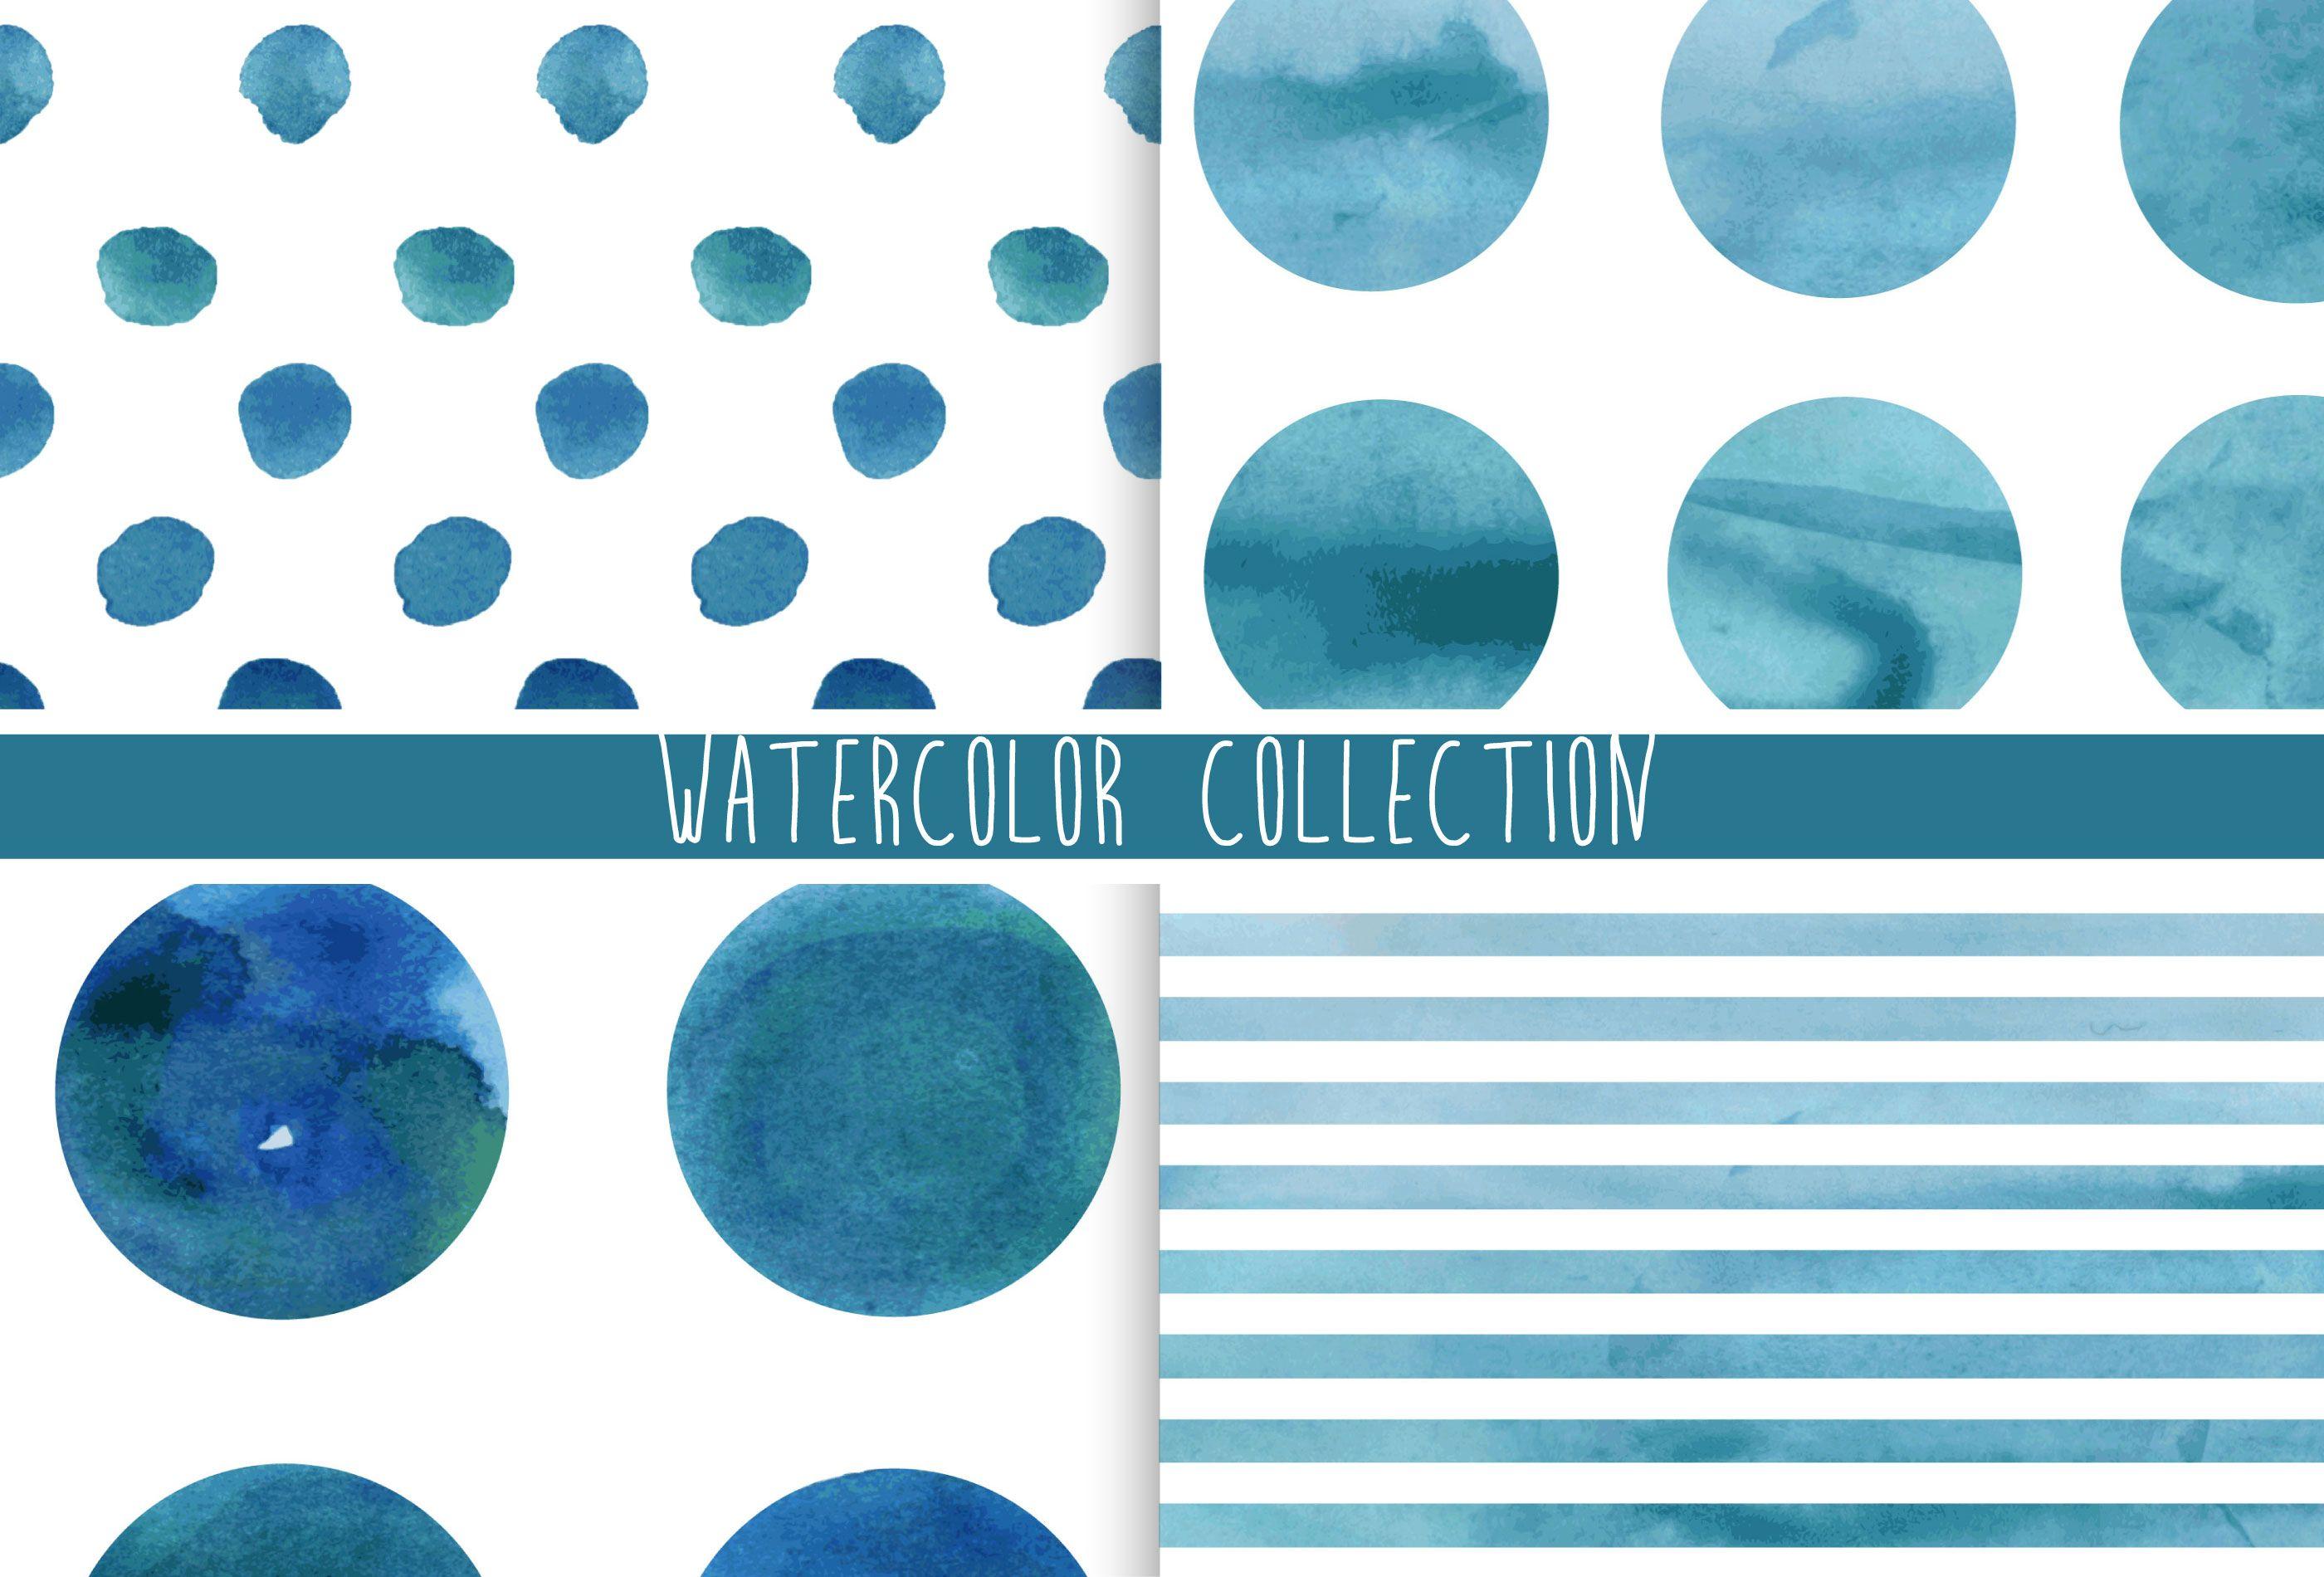 Watercolor pattern, lines, circles by Julia Dreams on @creativemarket